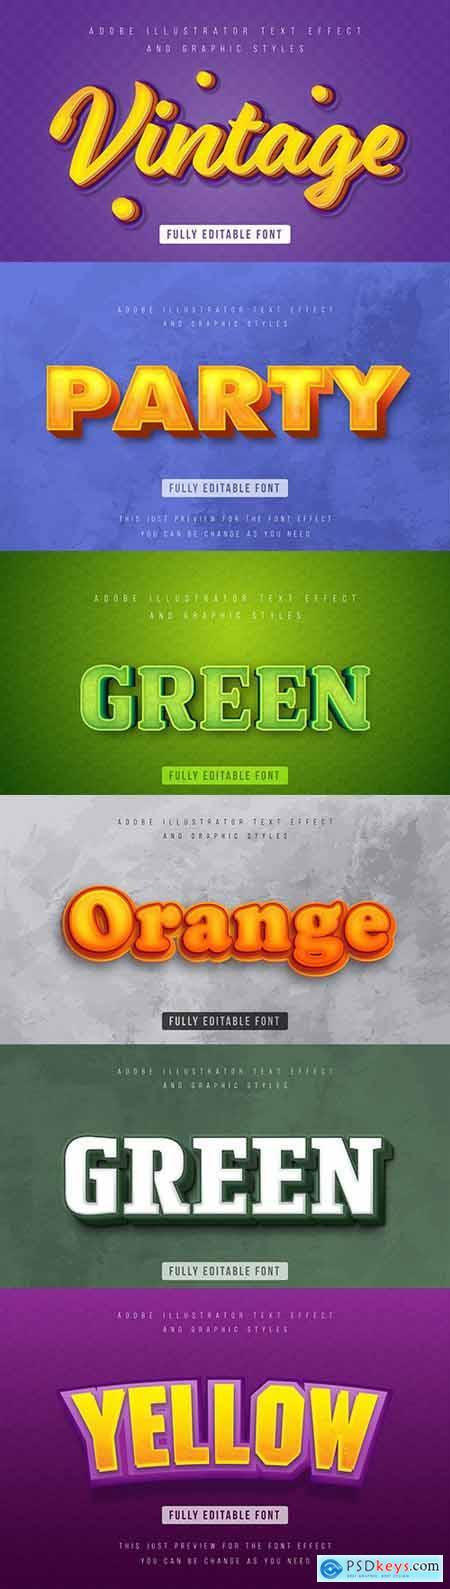 Editable font effect text collection illustration design 48